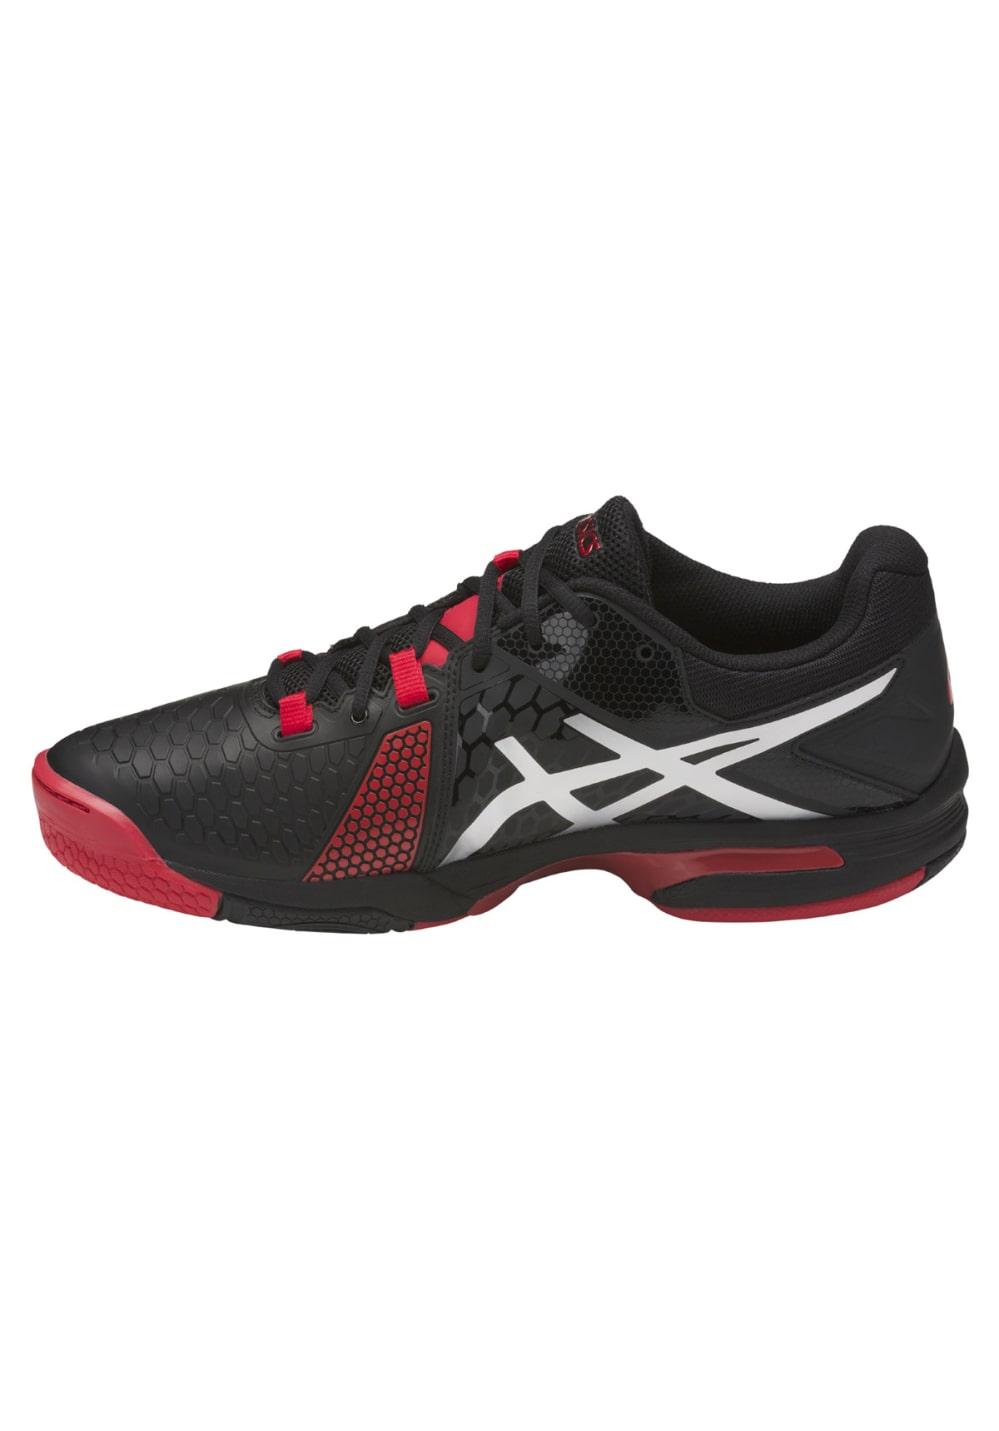 Pour Noir Homme Chaussures Blast 21run Gel Asics 7 Handball Pq00ZX